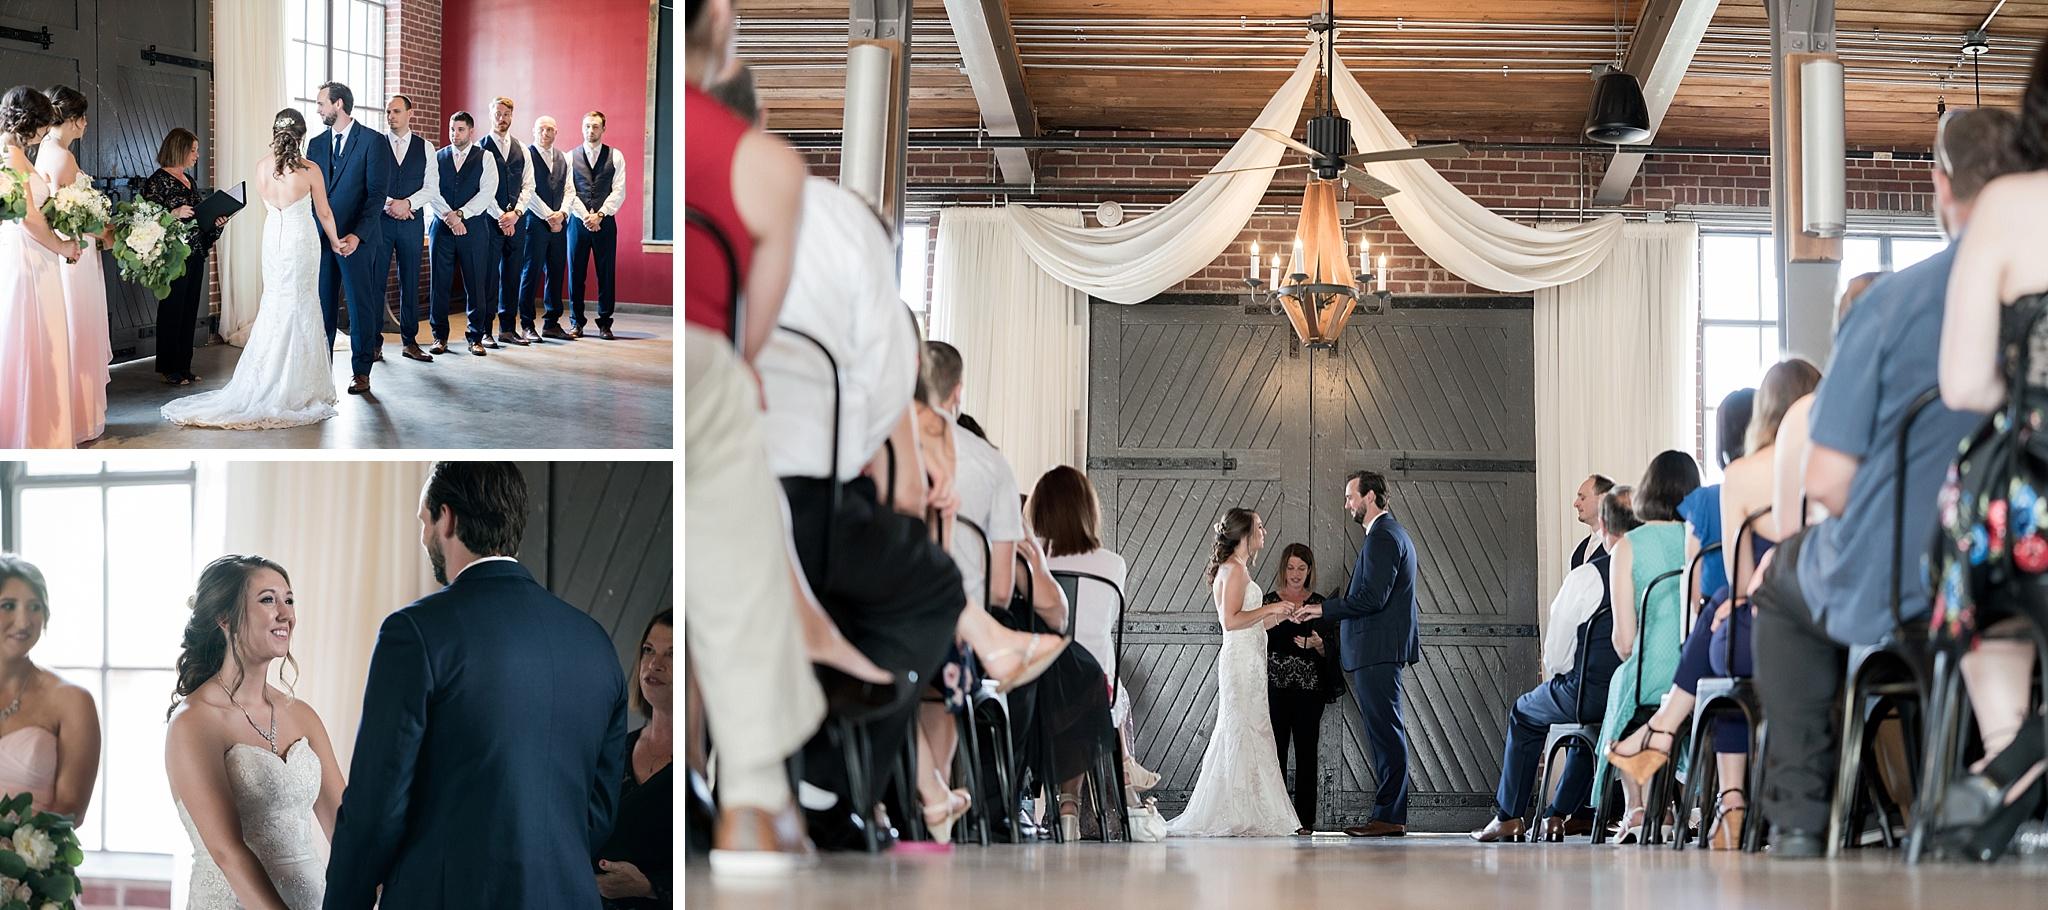 Rickhouse-Durham-NC-Wedding-Photographer-046.jpg